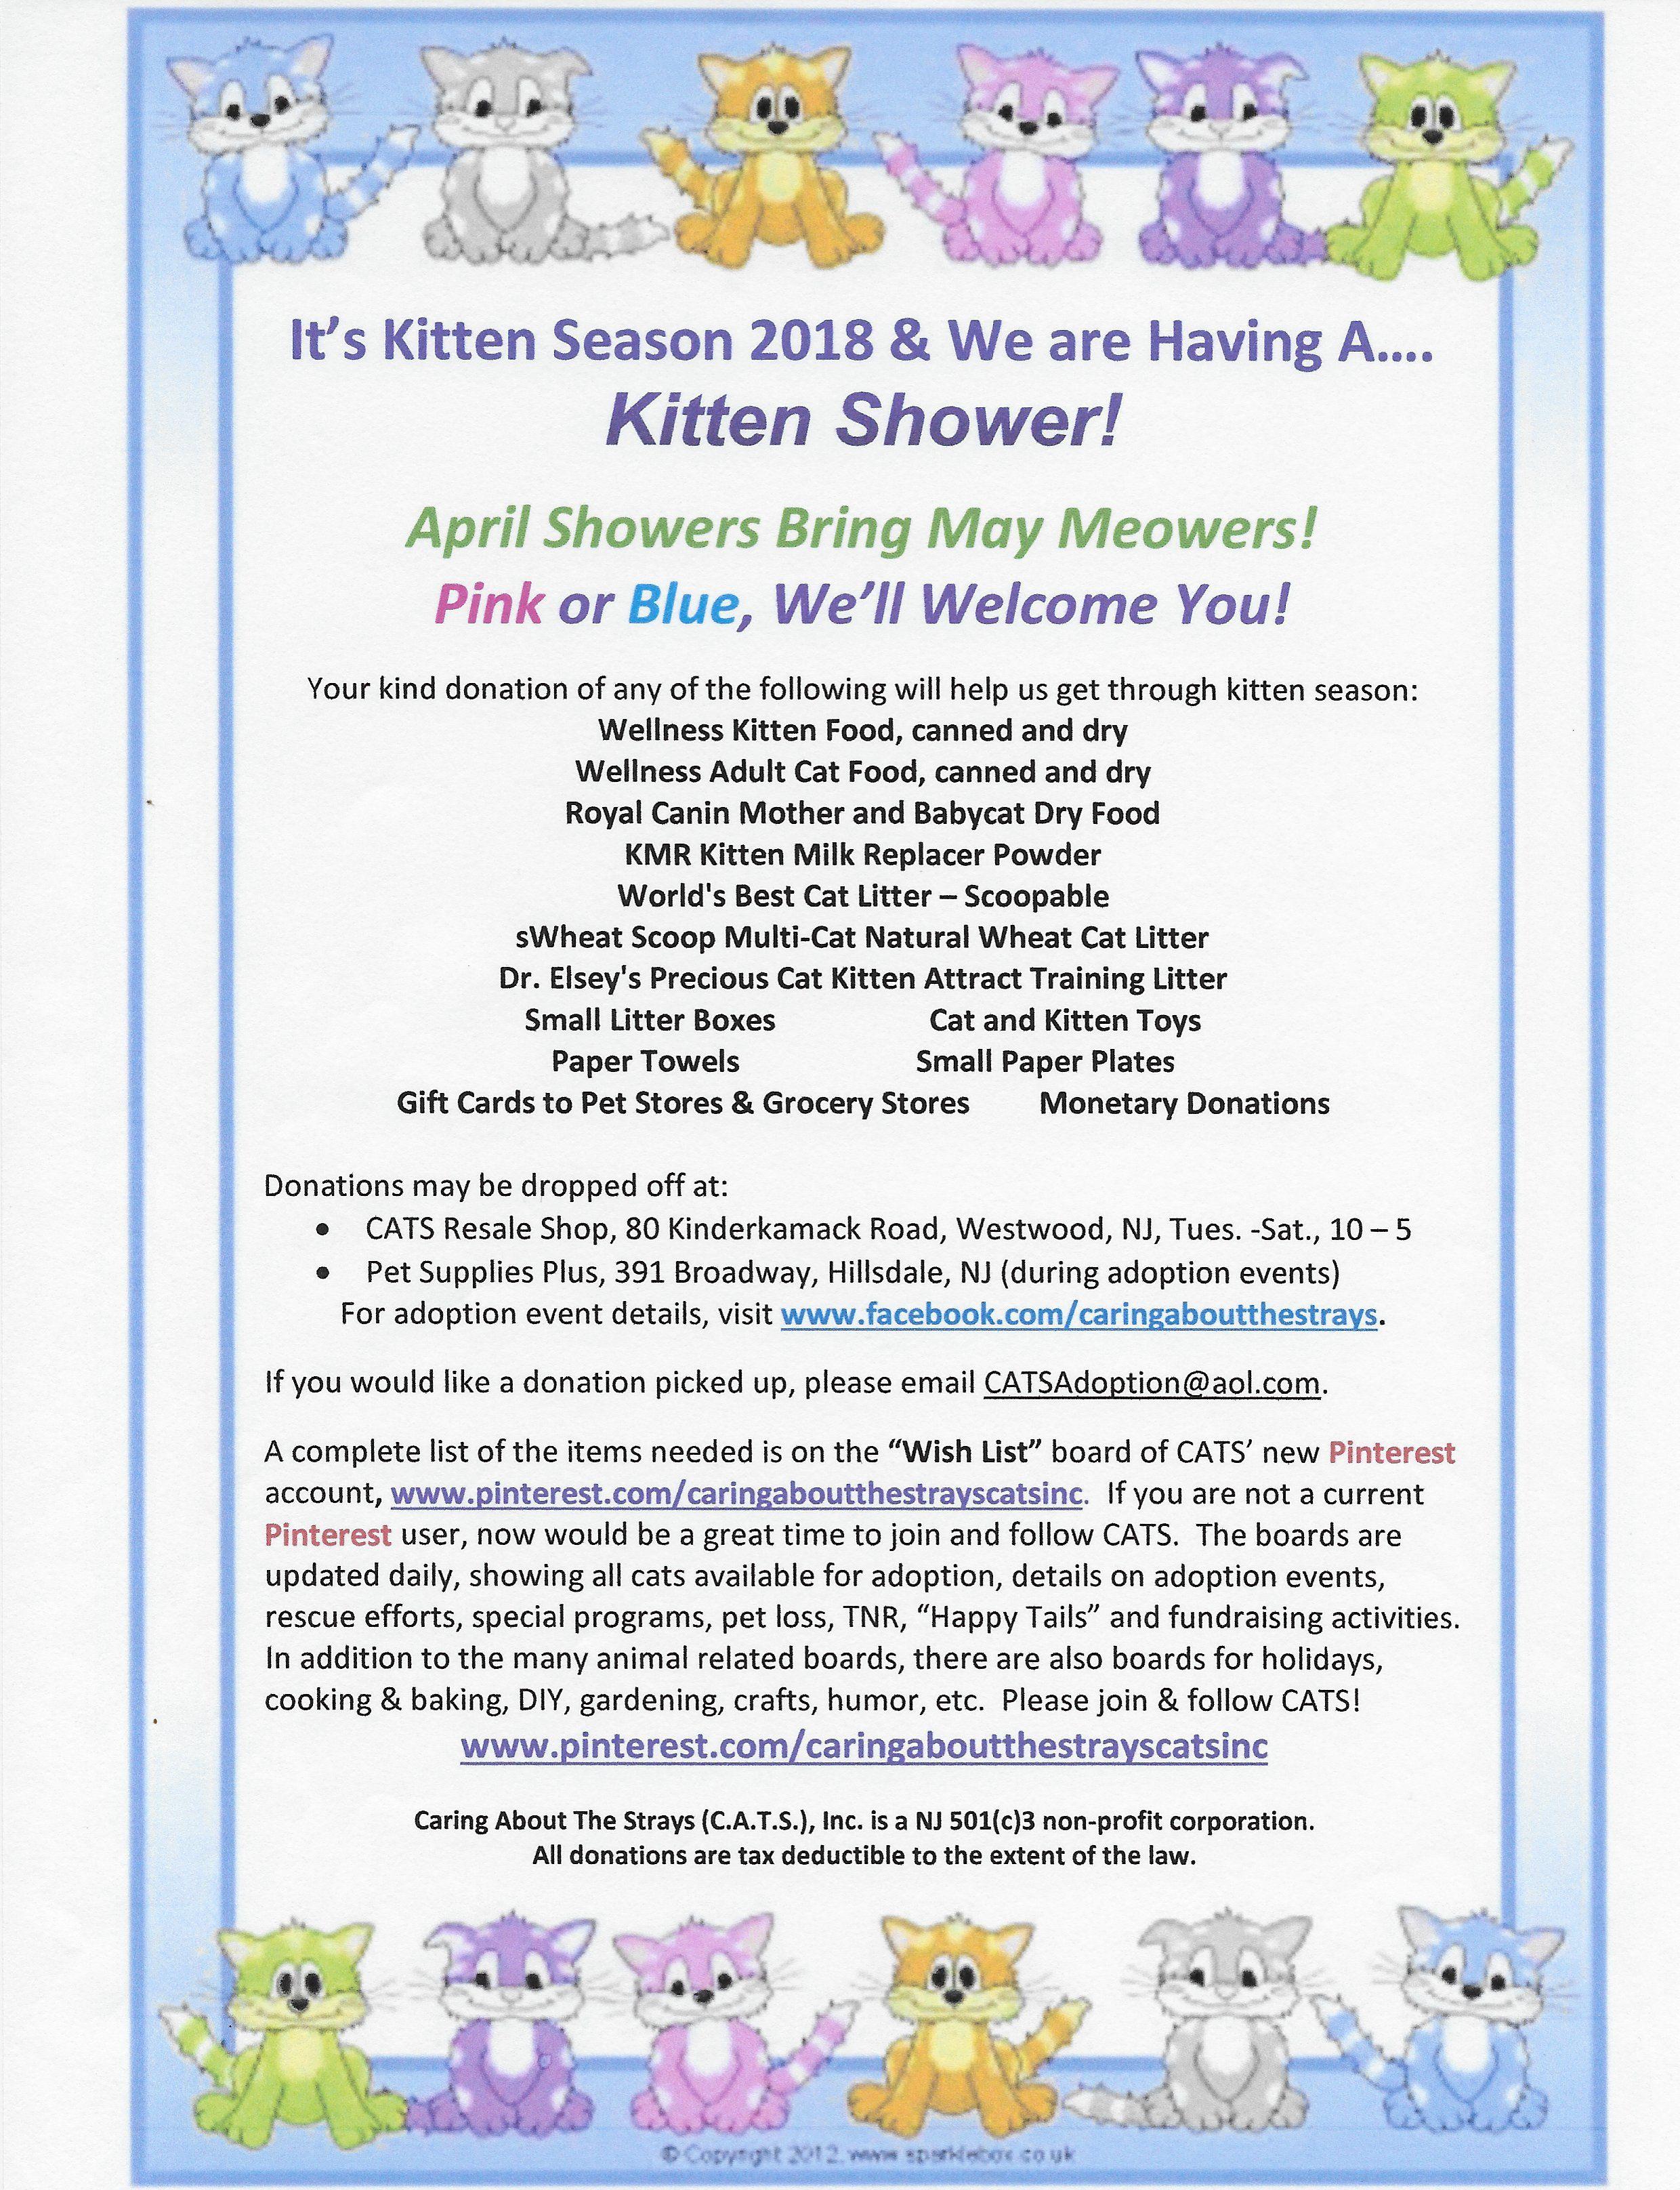 Kitten Shower Help Us Get Through Kitten Season By Donating Food Supplies Gift Cards Etc Donations May Be Drop Kitten Season Pet Supplies Plus Kitten Care